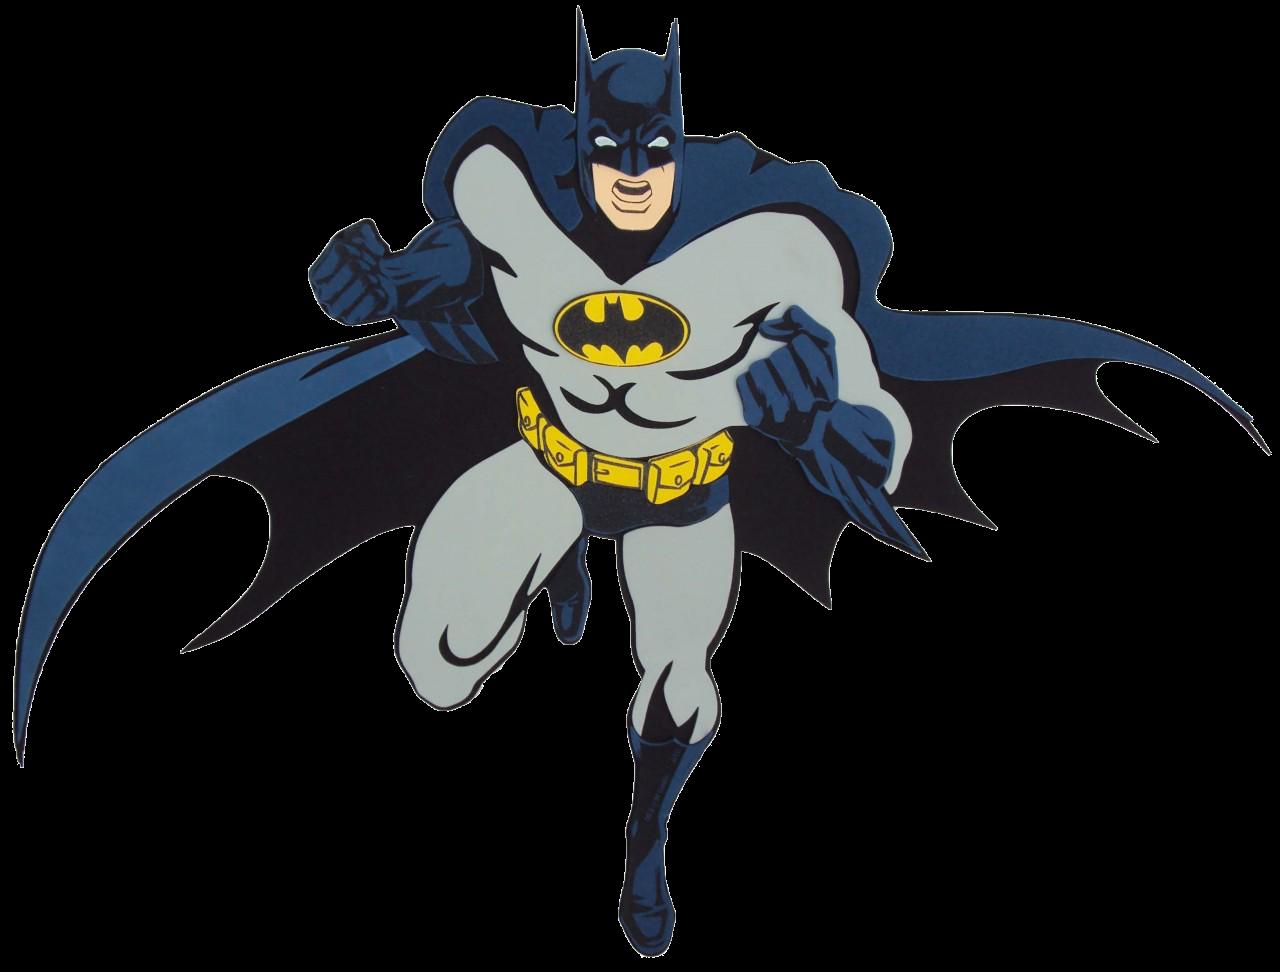 Minion clipart batman. Cartoon at getdrawings com